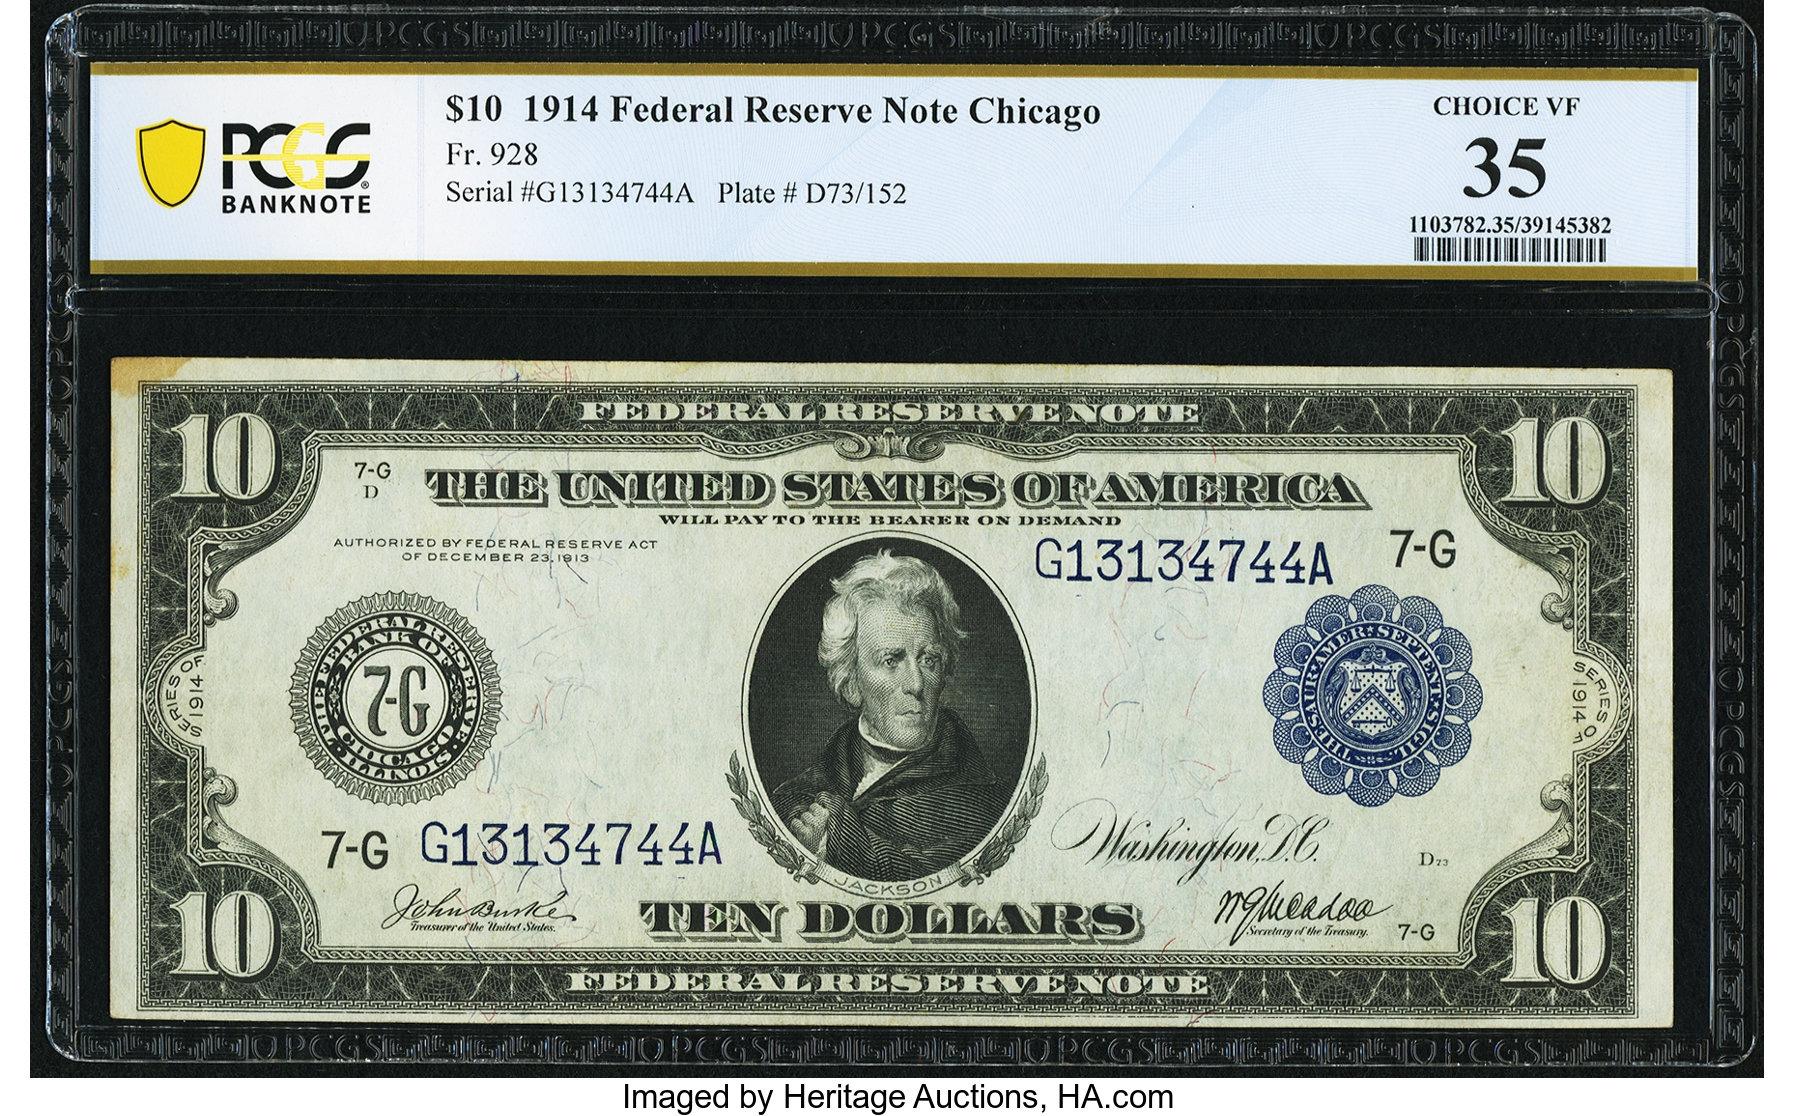 sample image for Fr.928 $10 Chicago